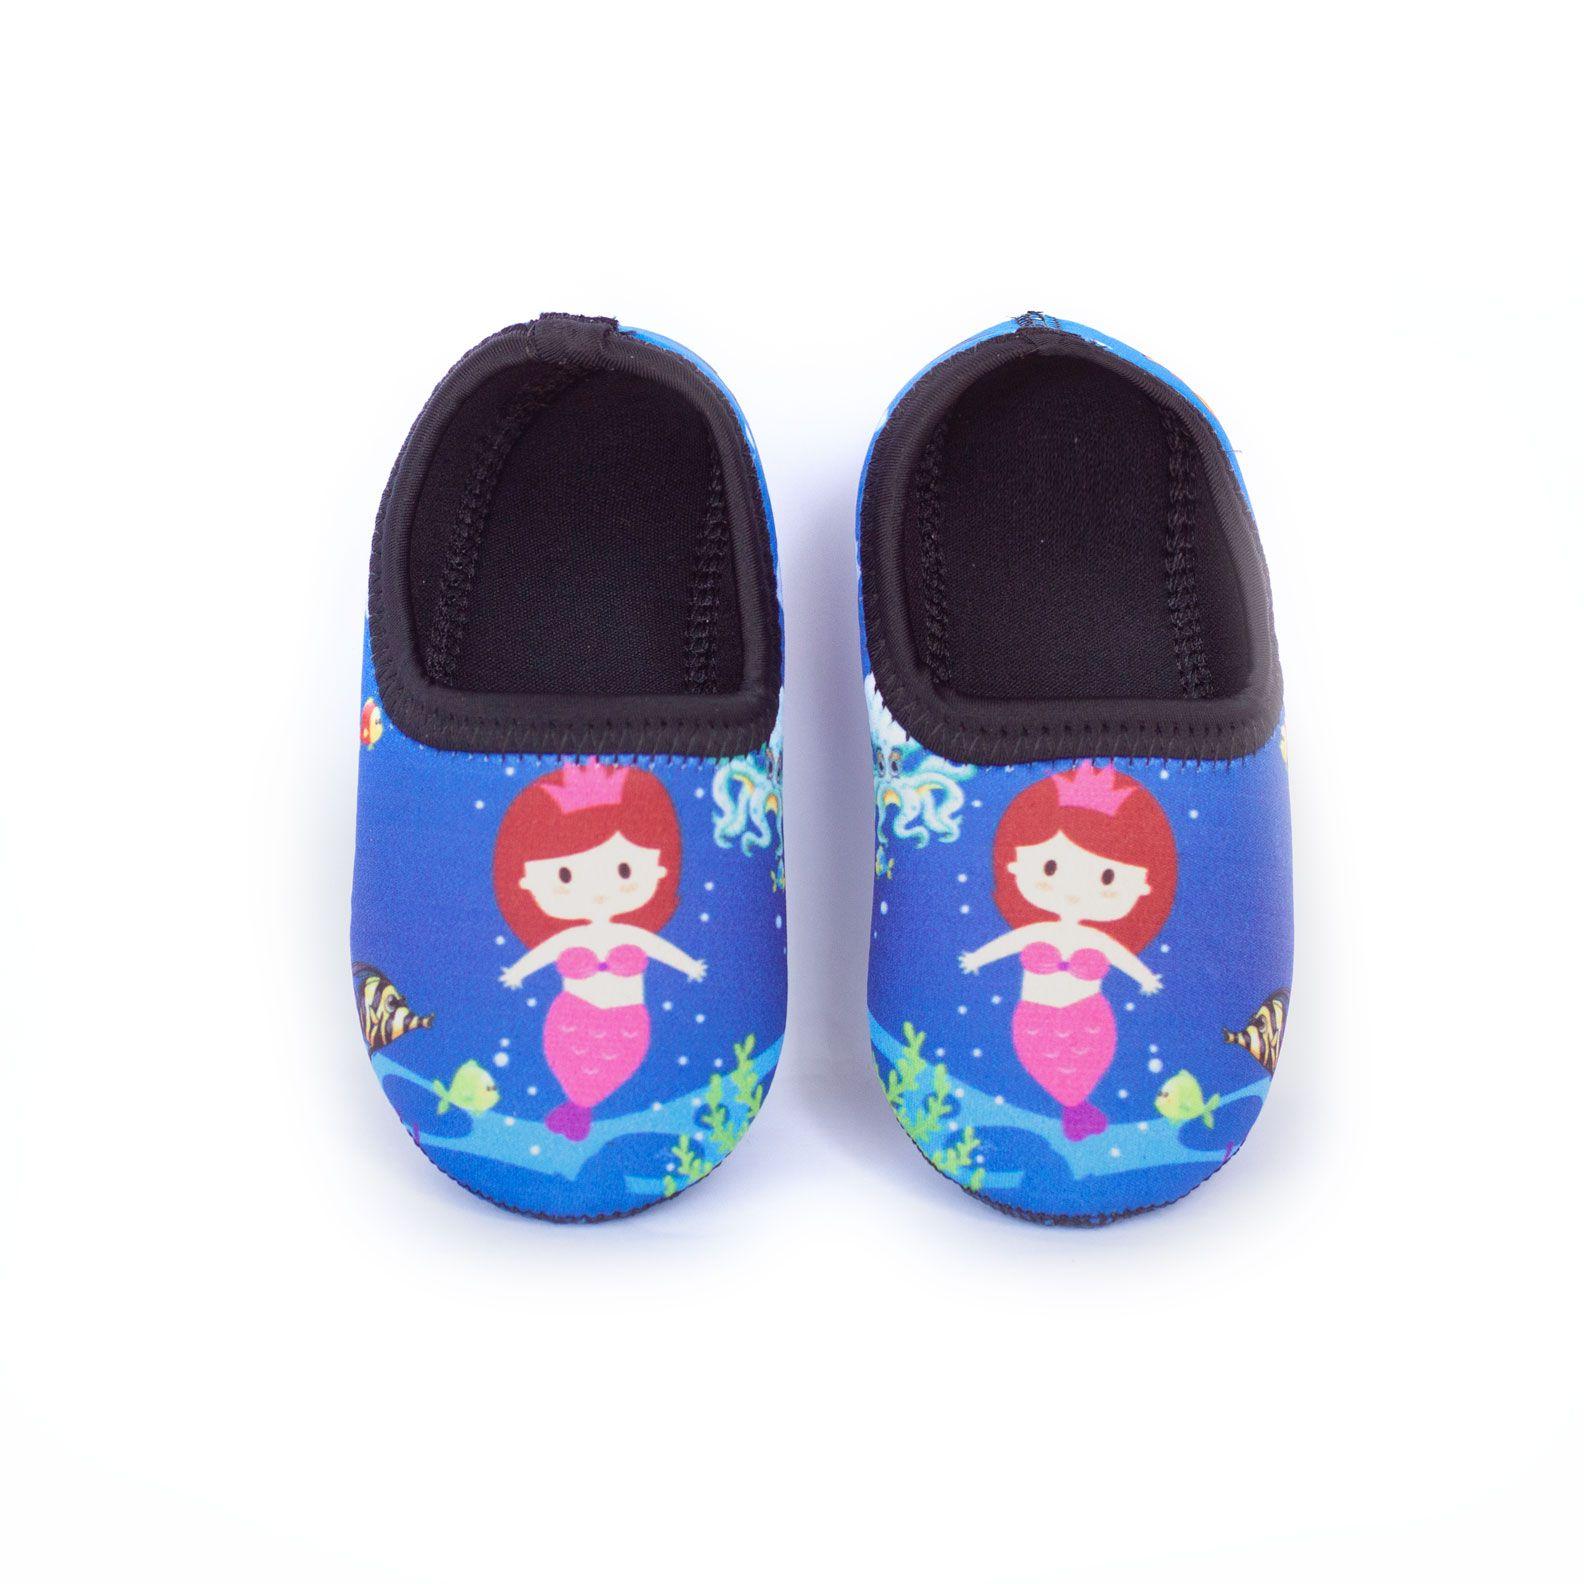 Sapato de Neoprene Infantil Fit Sereia Ufrog